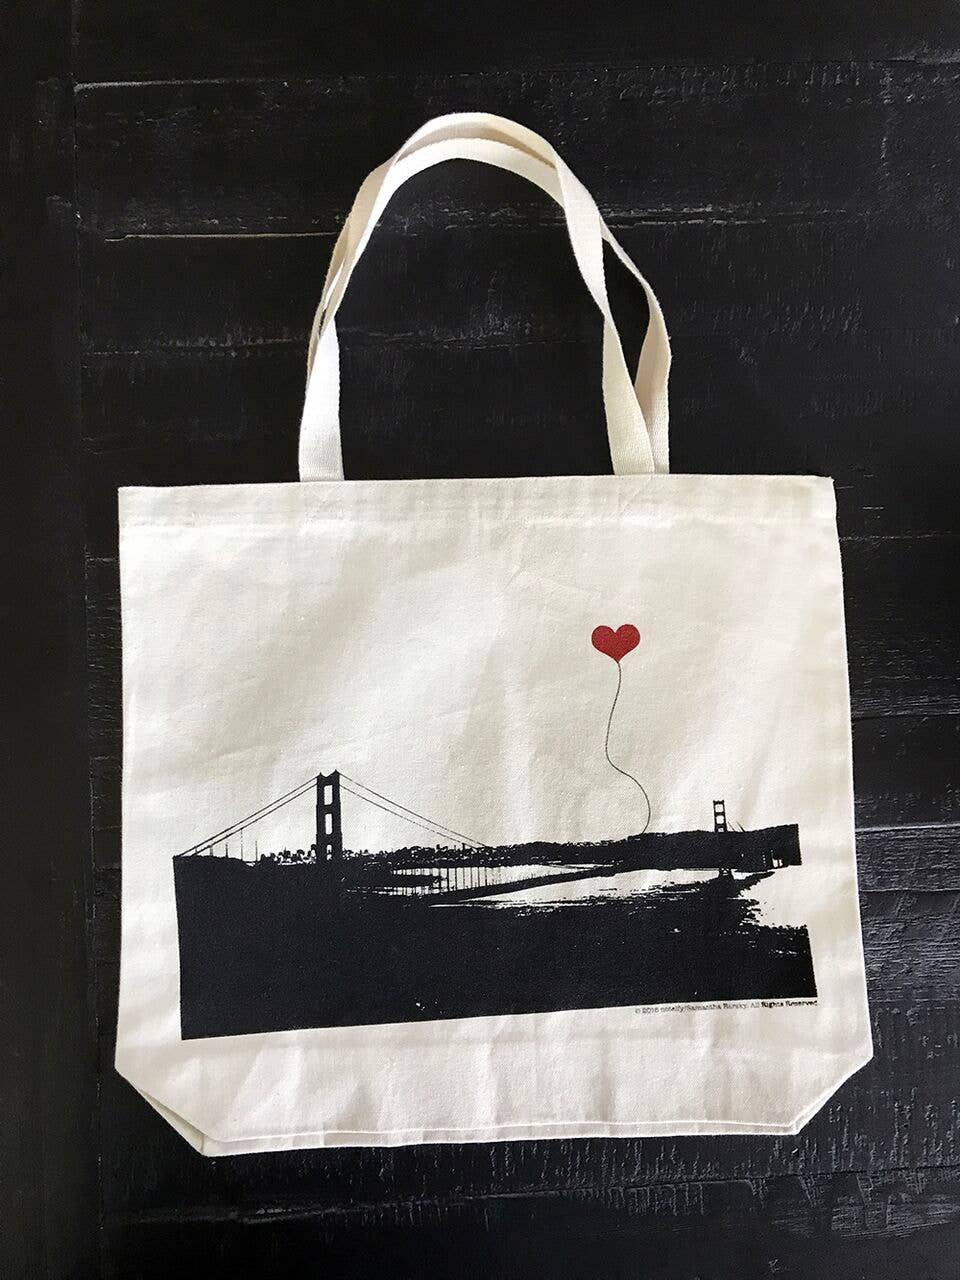 San Francisco Golden Gate Bridge Wideshot Tote Bag | Trada Marketplace